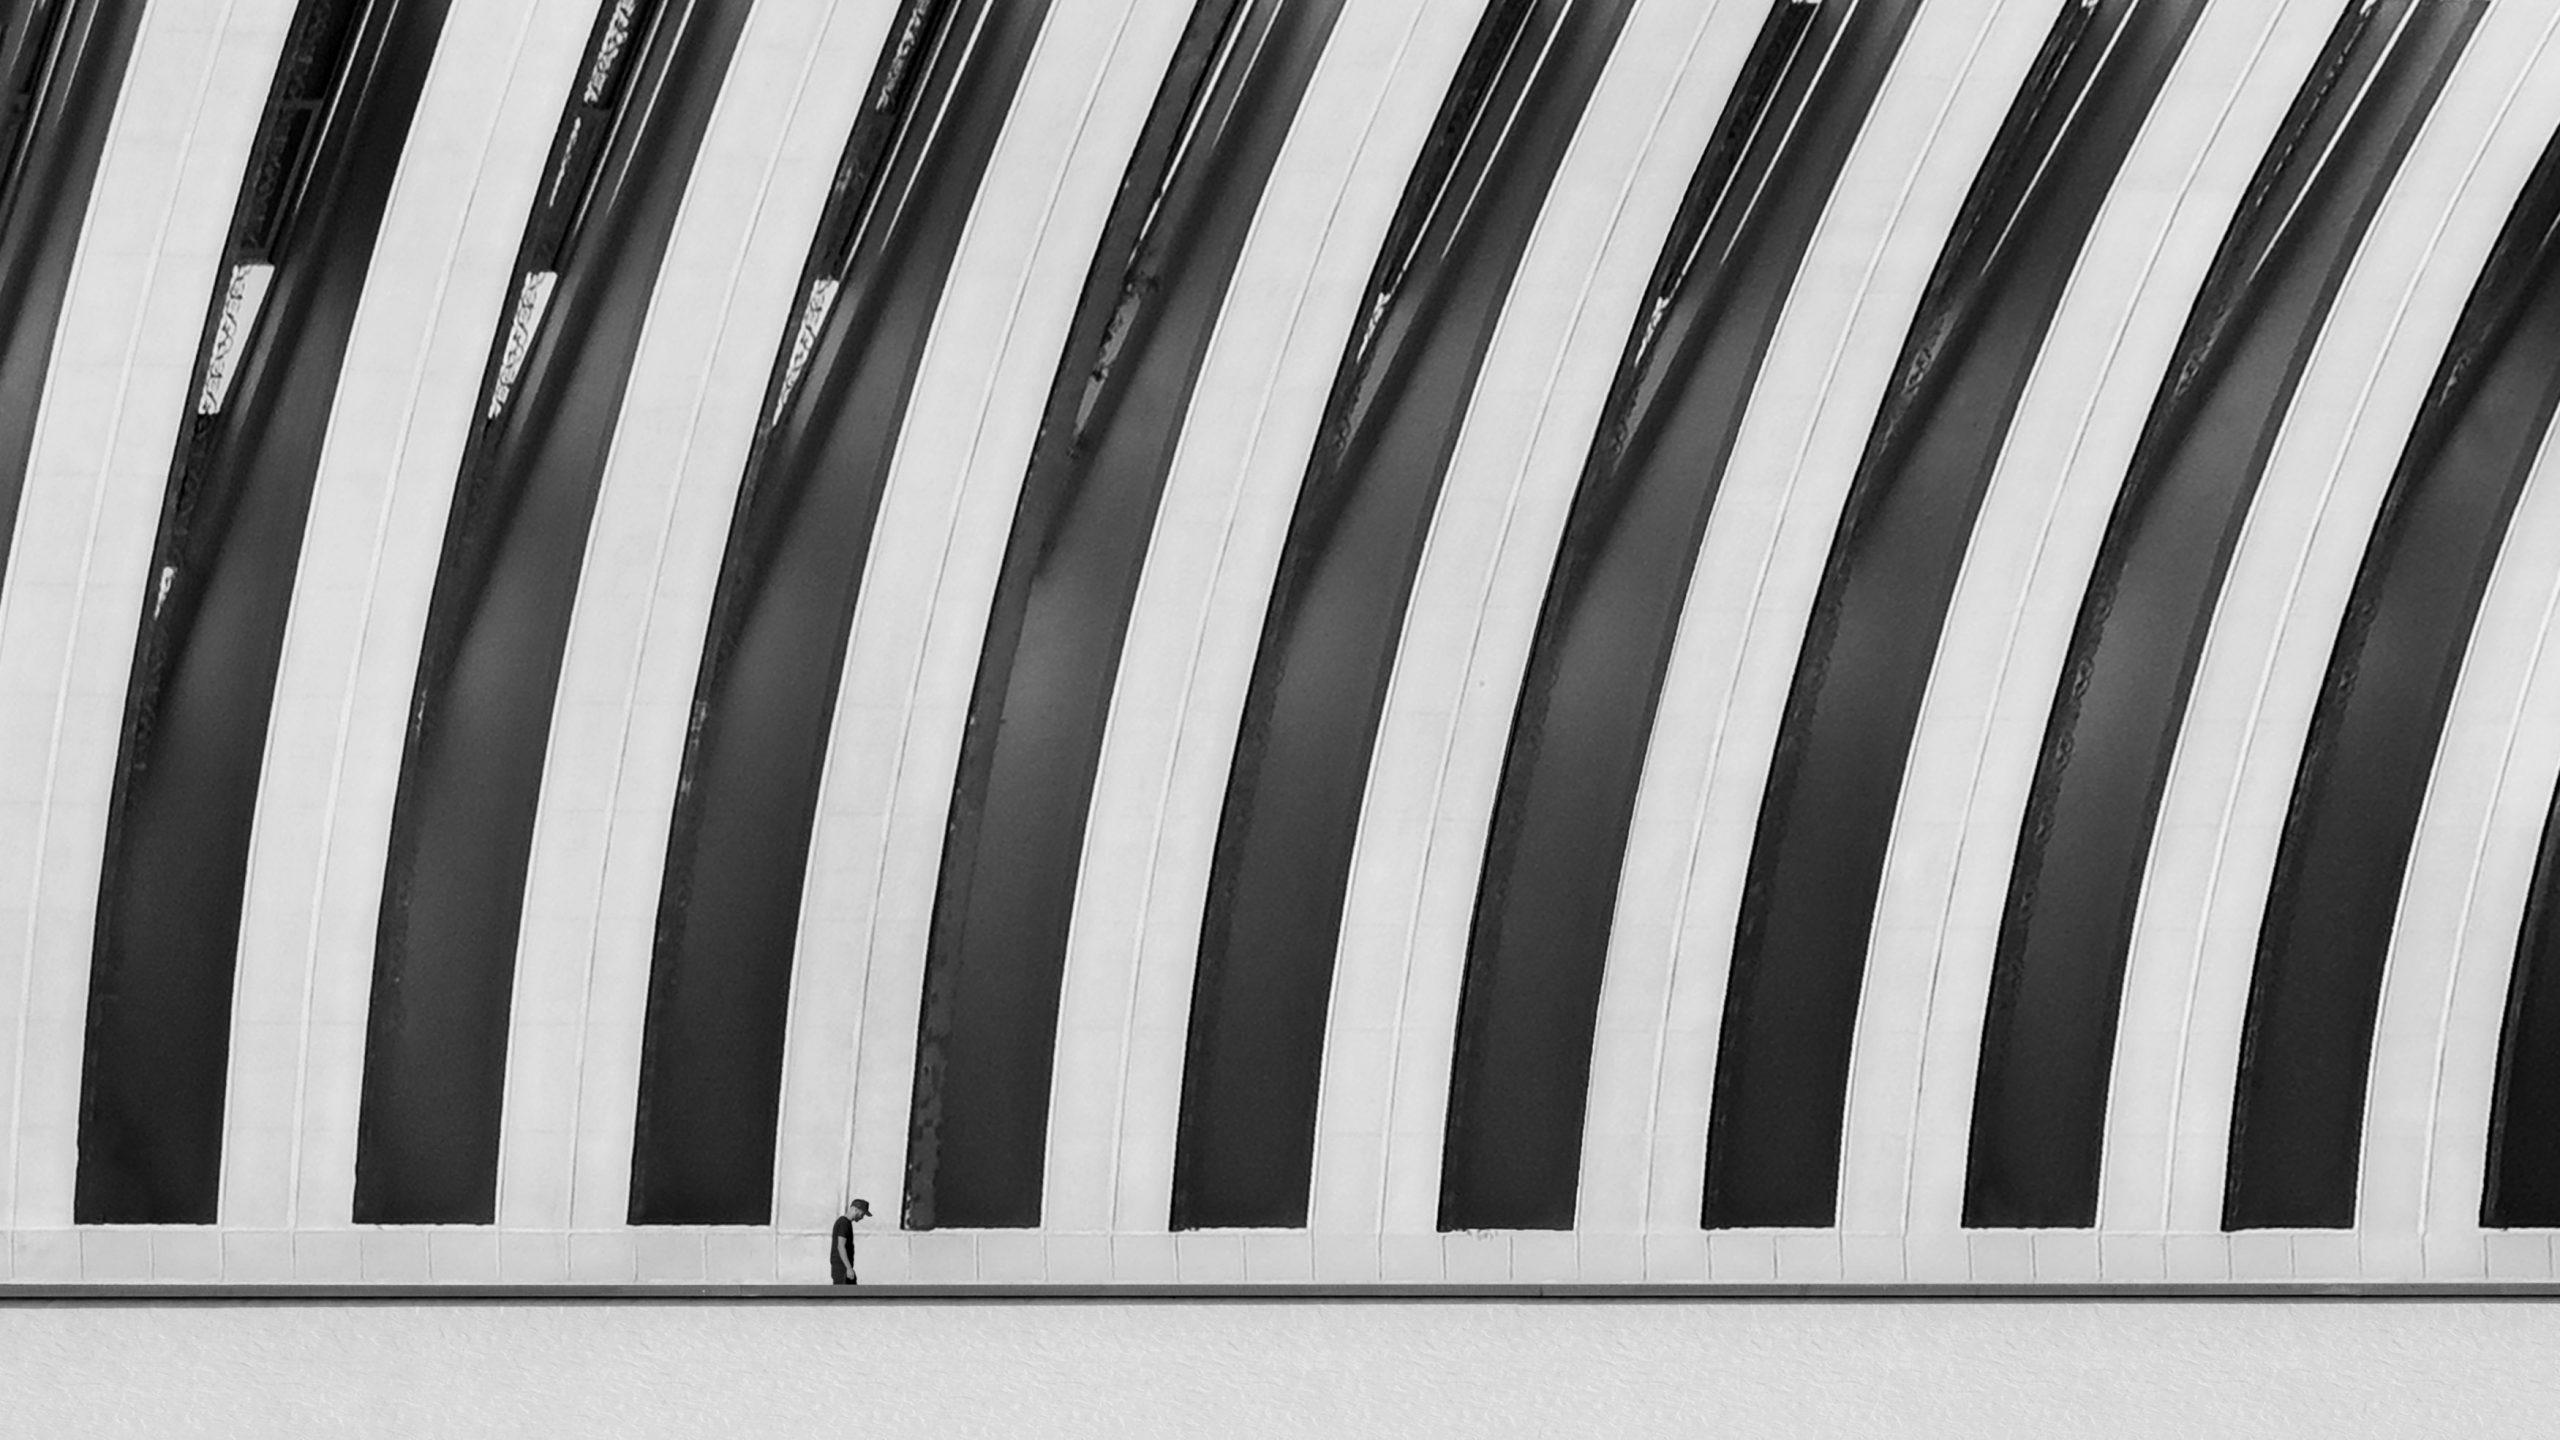 Categorie: Arch. & Interior - Photographer: ALI ZOLGHADRI- Location: Tehran, Tehran, Iran